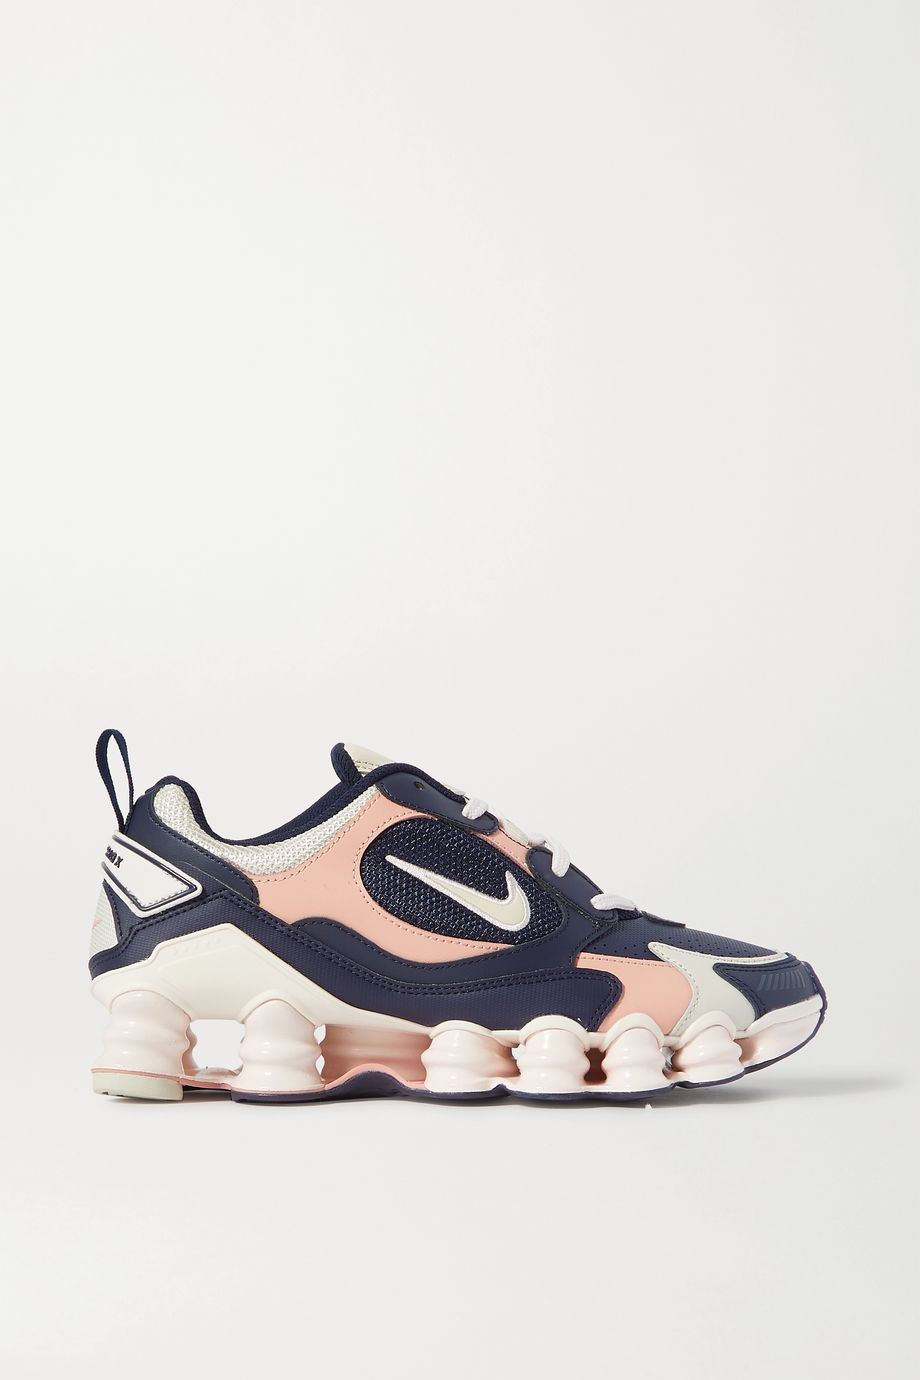 Nike Shox TL Nova leather and mesh sneakers